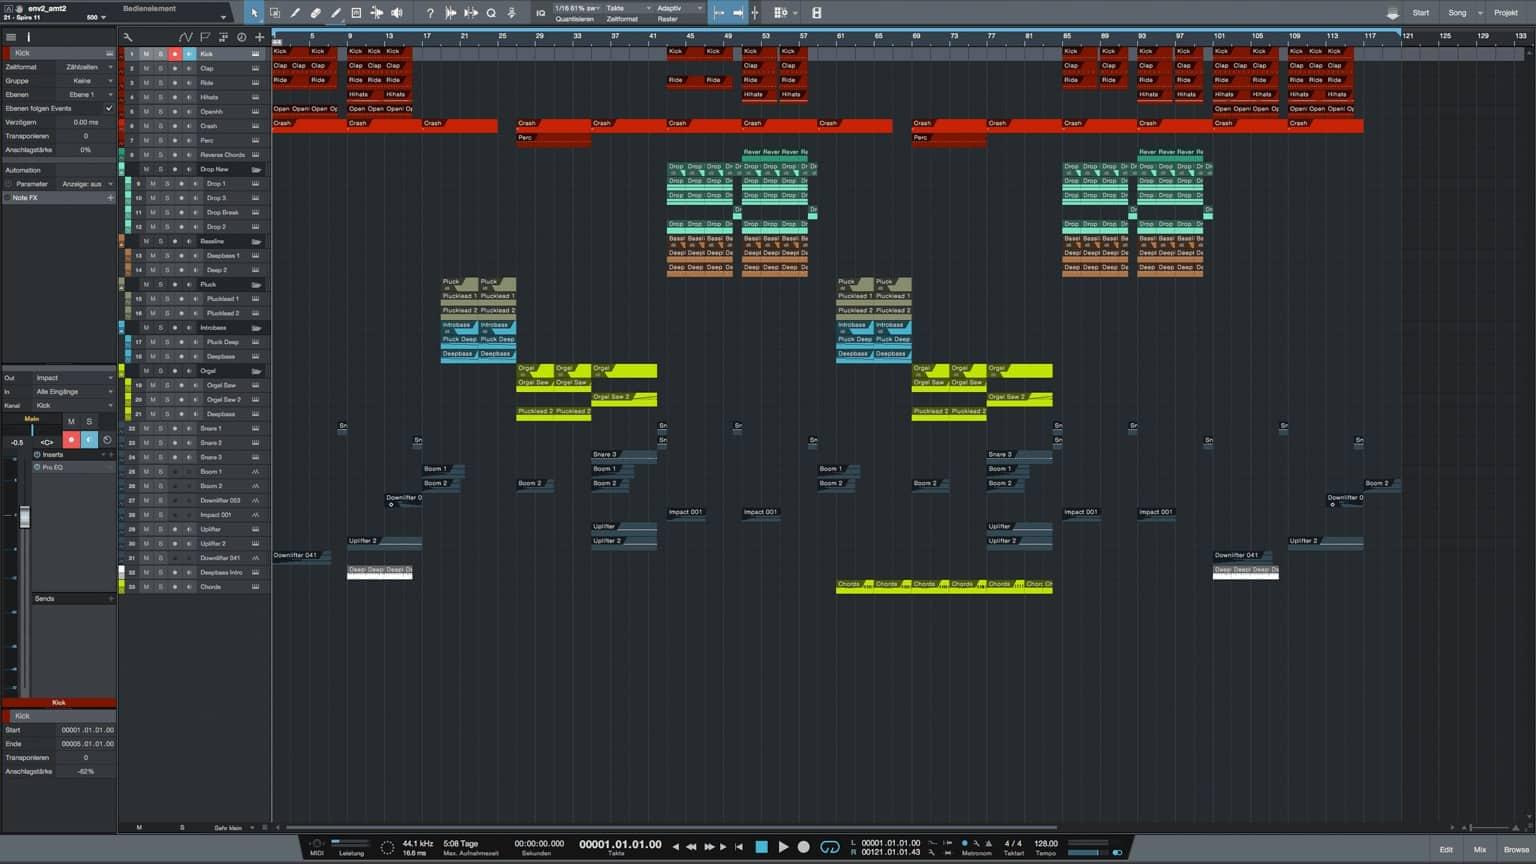 Running-Studio-One-Pro-Template1